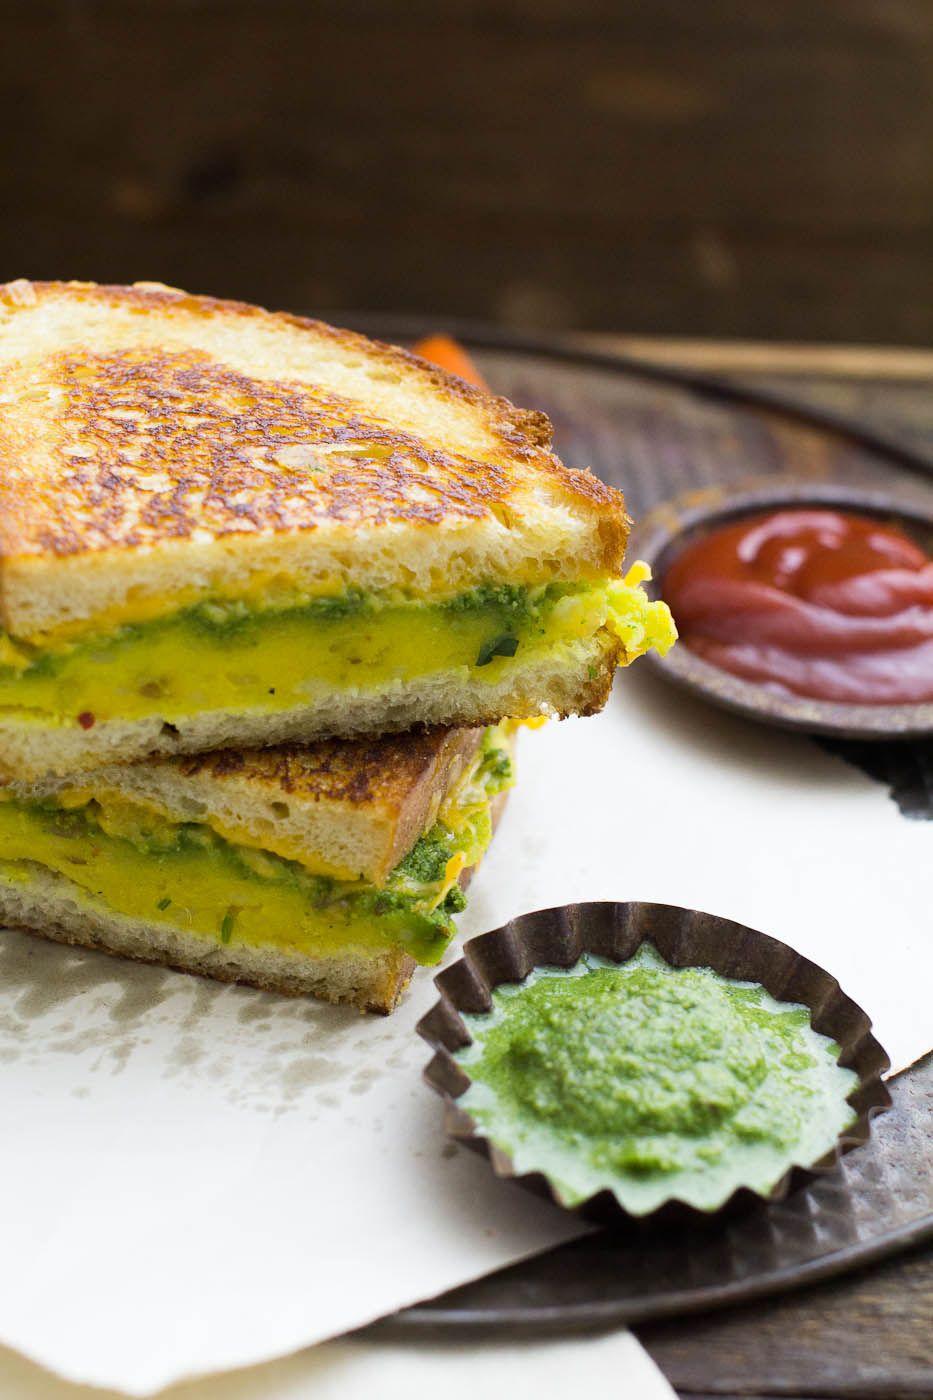 Potato sandwiches indiaphile potato sandwiches recipe by indiaphilefo forumfinder Choice Image